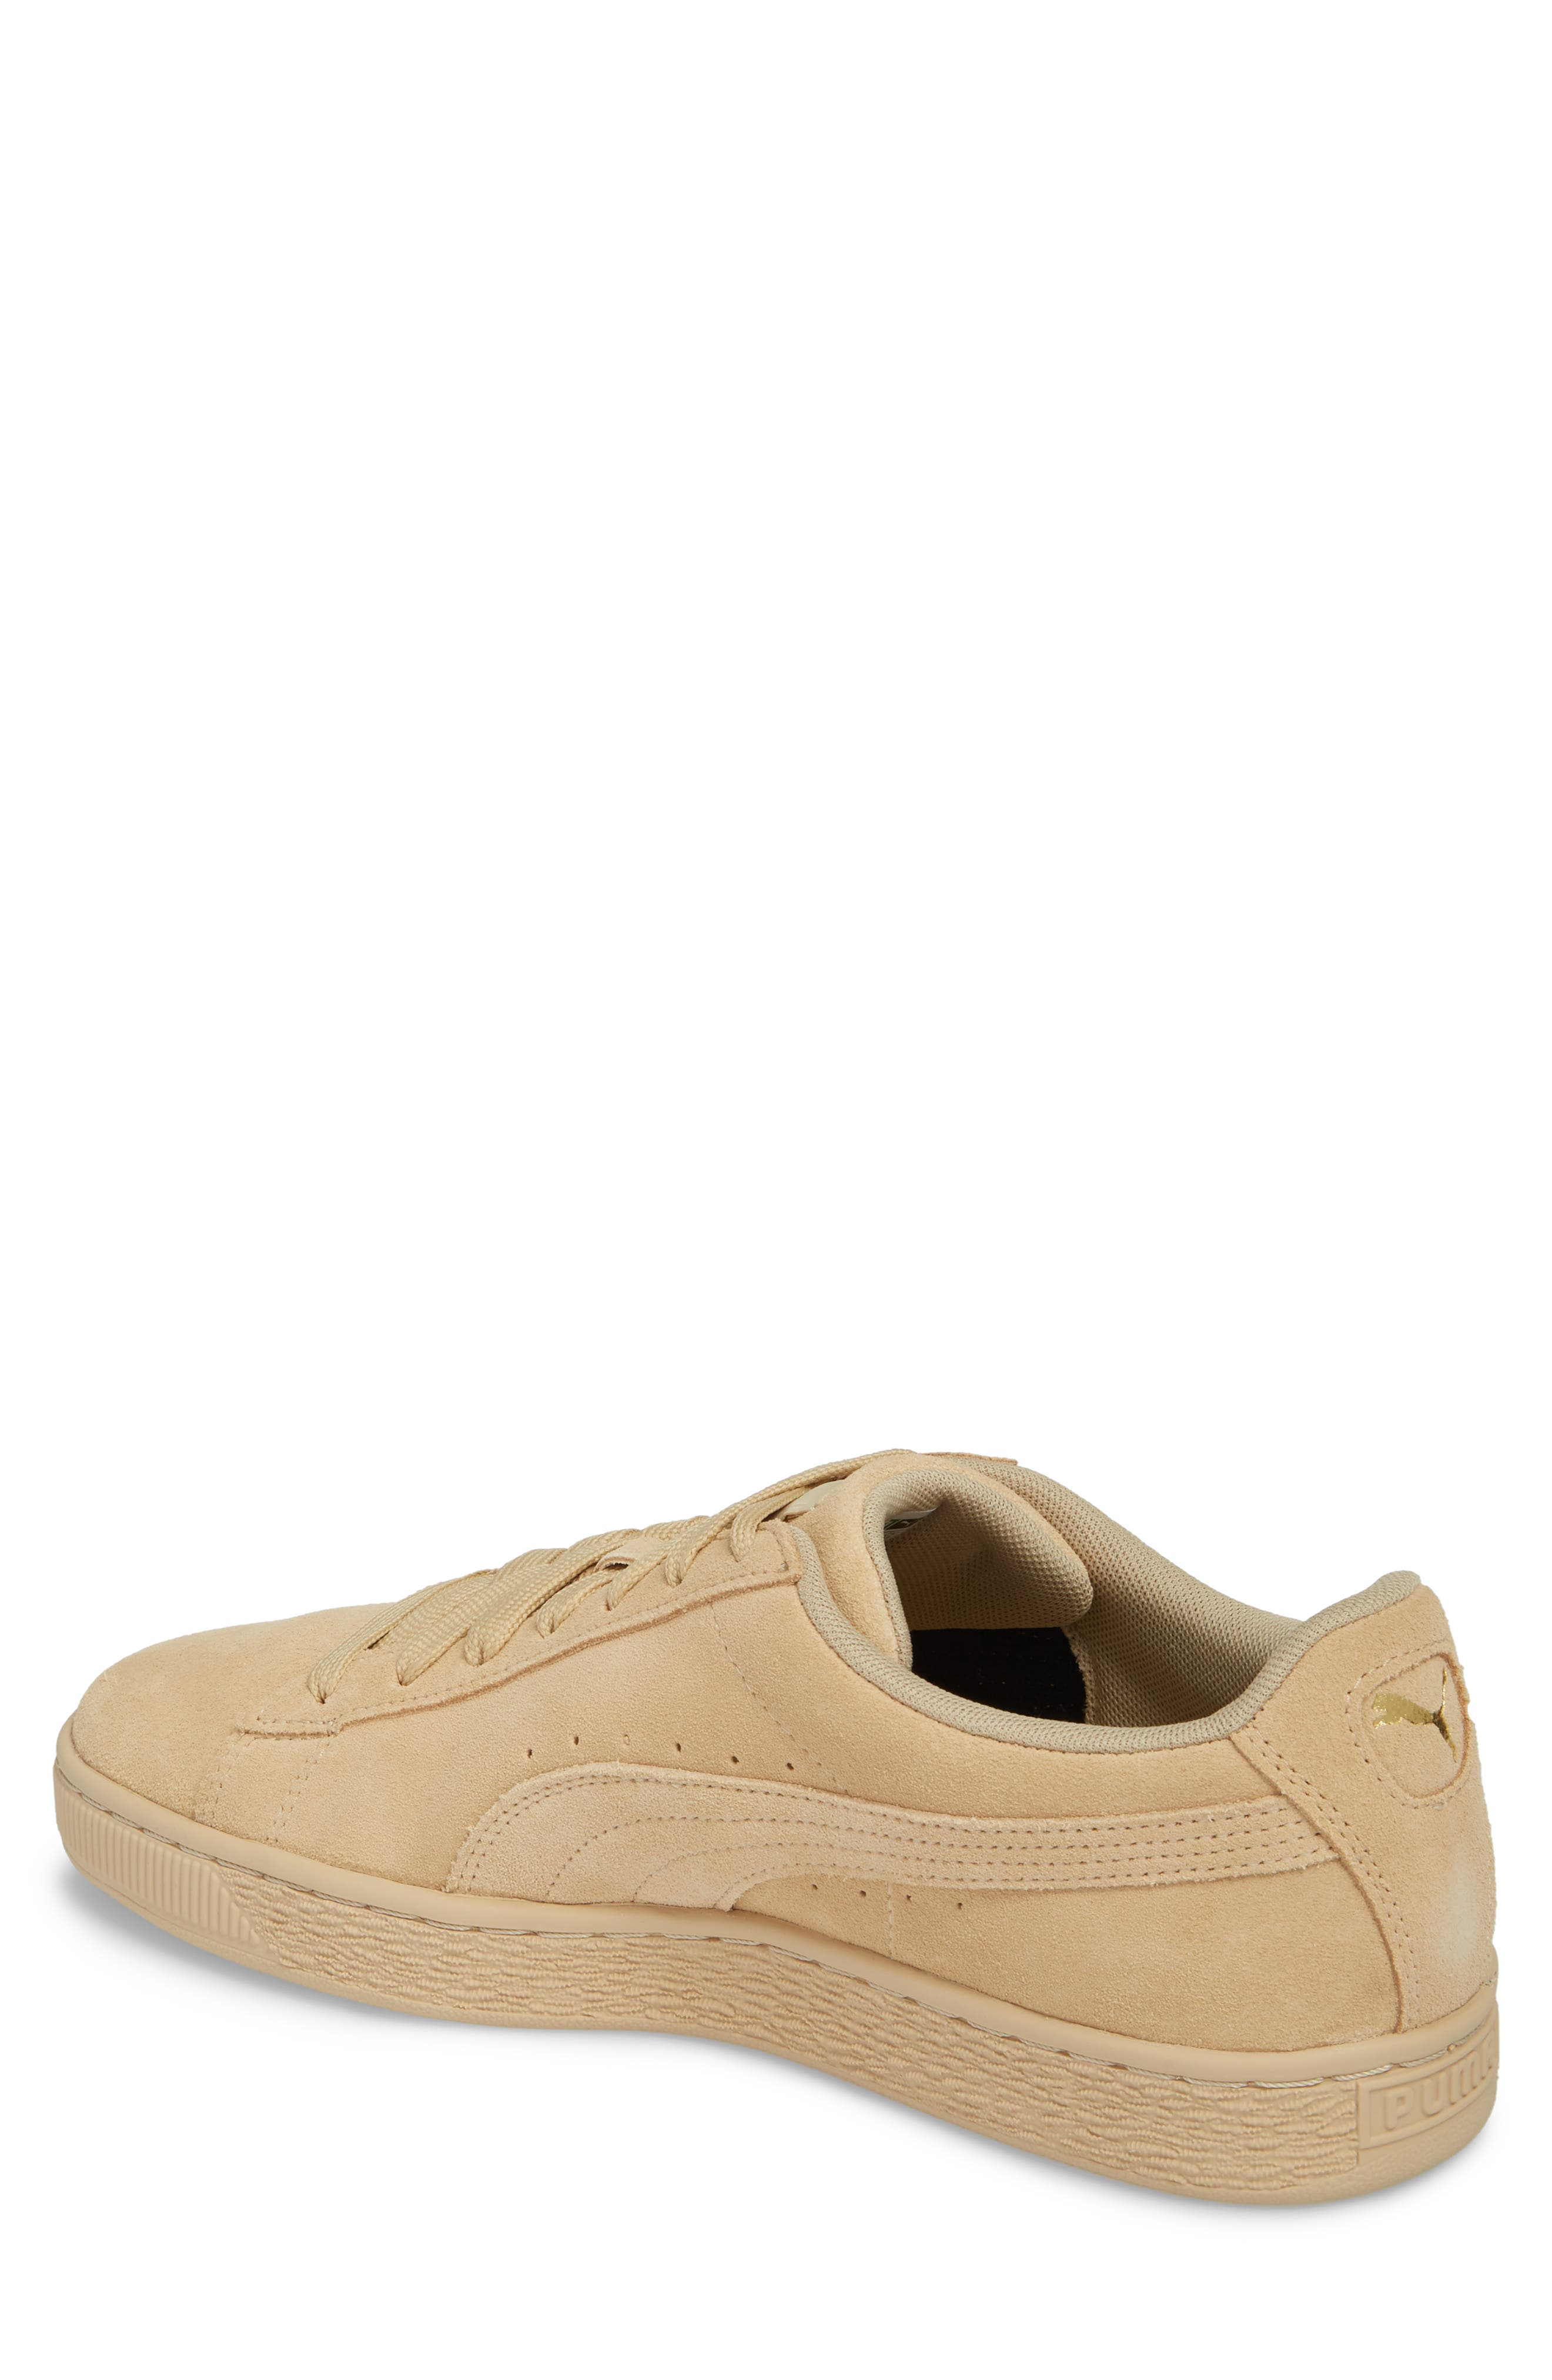 Suede Classic Tonal Sneaker,                             Alternate thumbnail 2, color,                             Pebble Suede